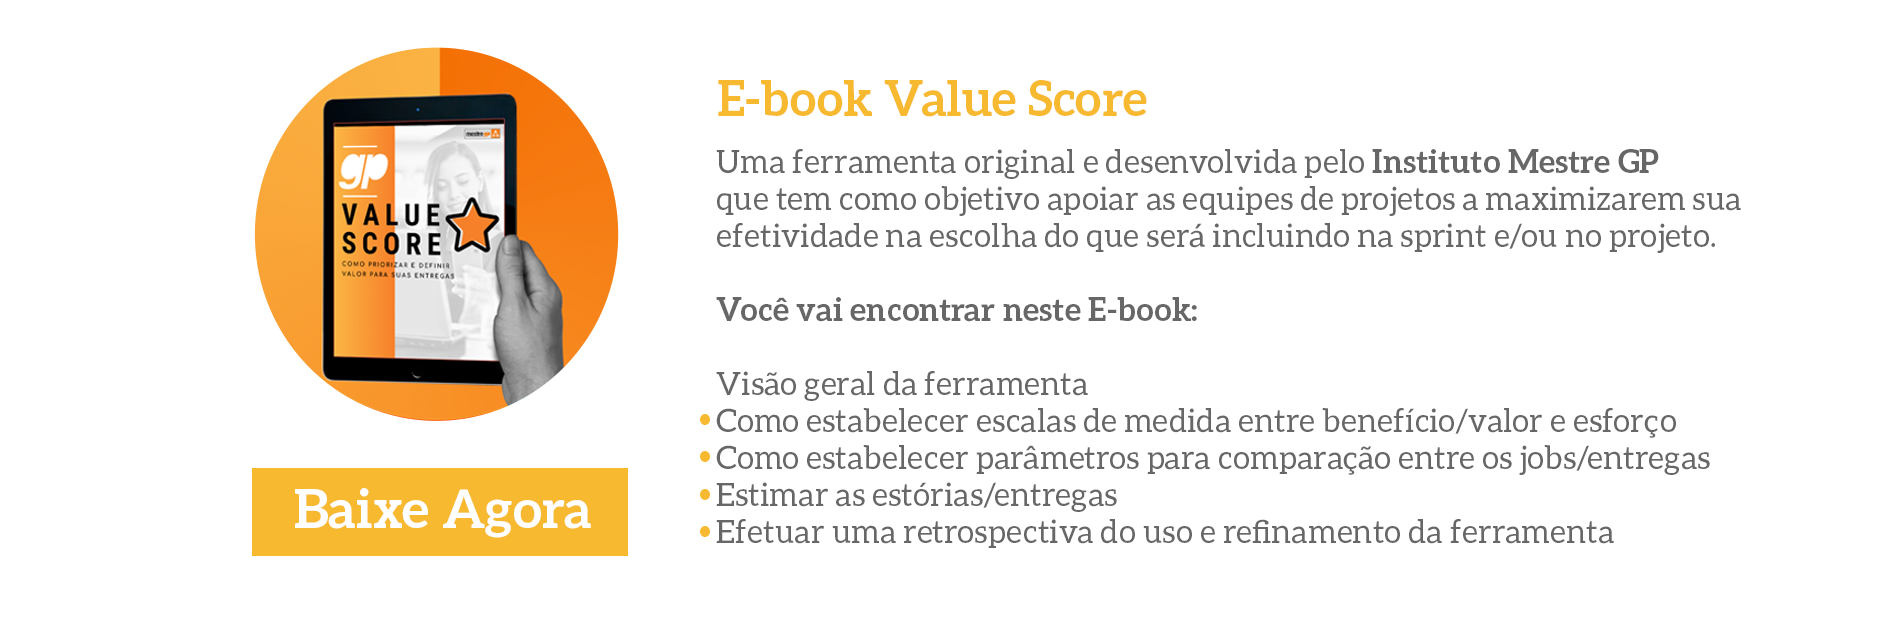 https://www.mestregp.com.br/wp-content/uploads/2019/12/Value_Score-1900x631.png